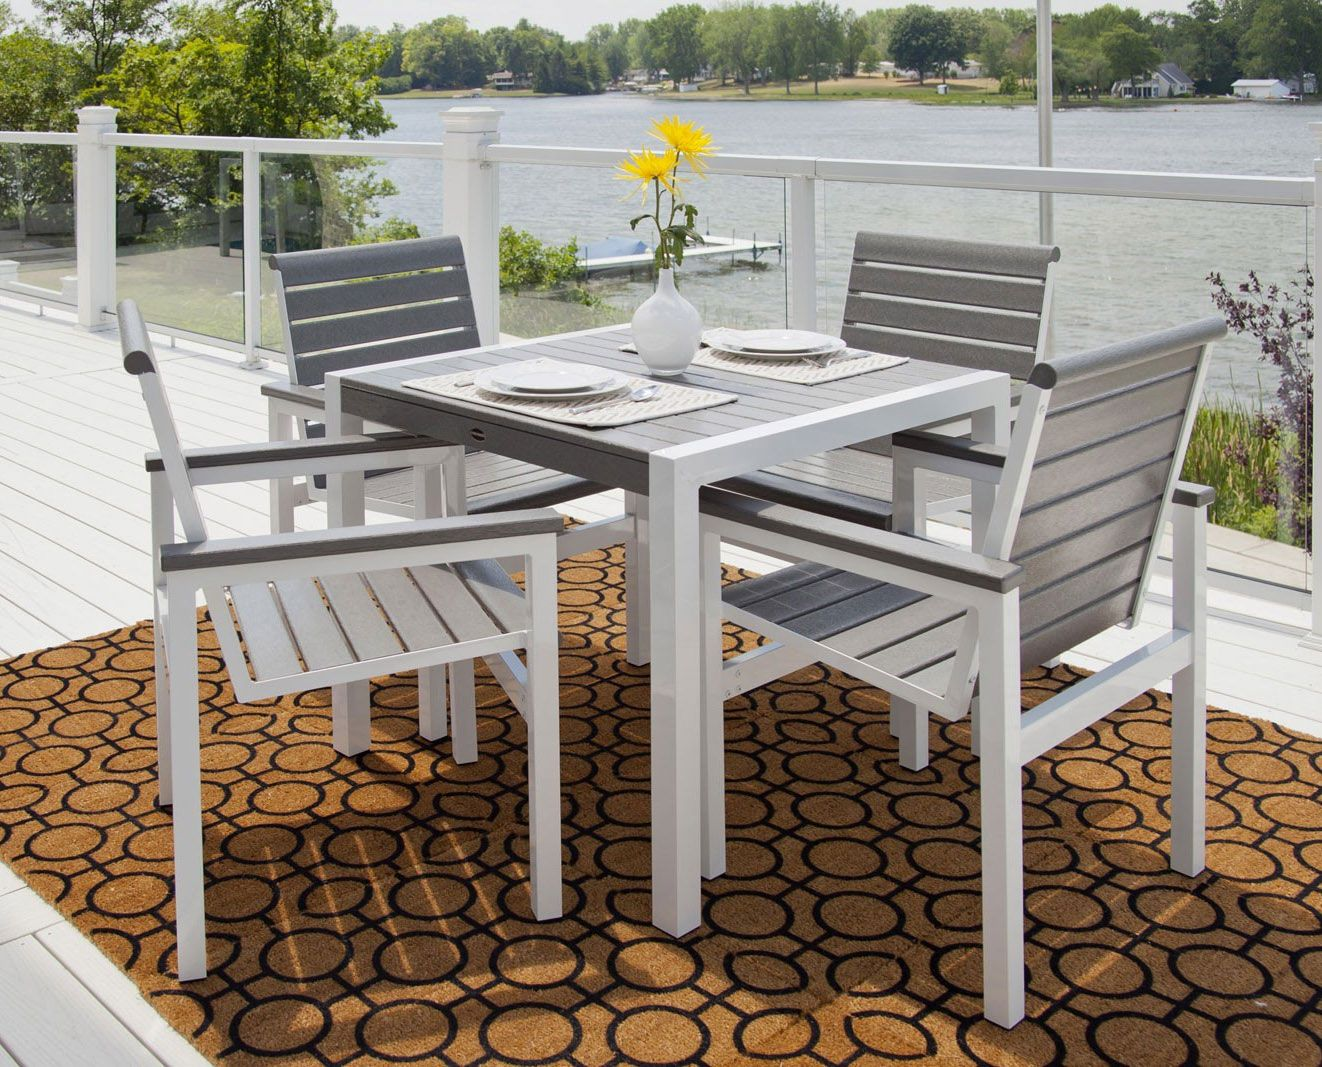 Simple Polywood Outdoor Furniture As Idea Of Exterior Home Design Http Www Amazadesign Com Si Polywood Outdoor Furniture Patio Dining Set Outdoor Furniture